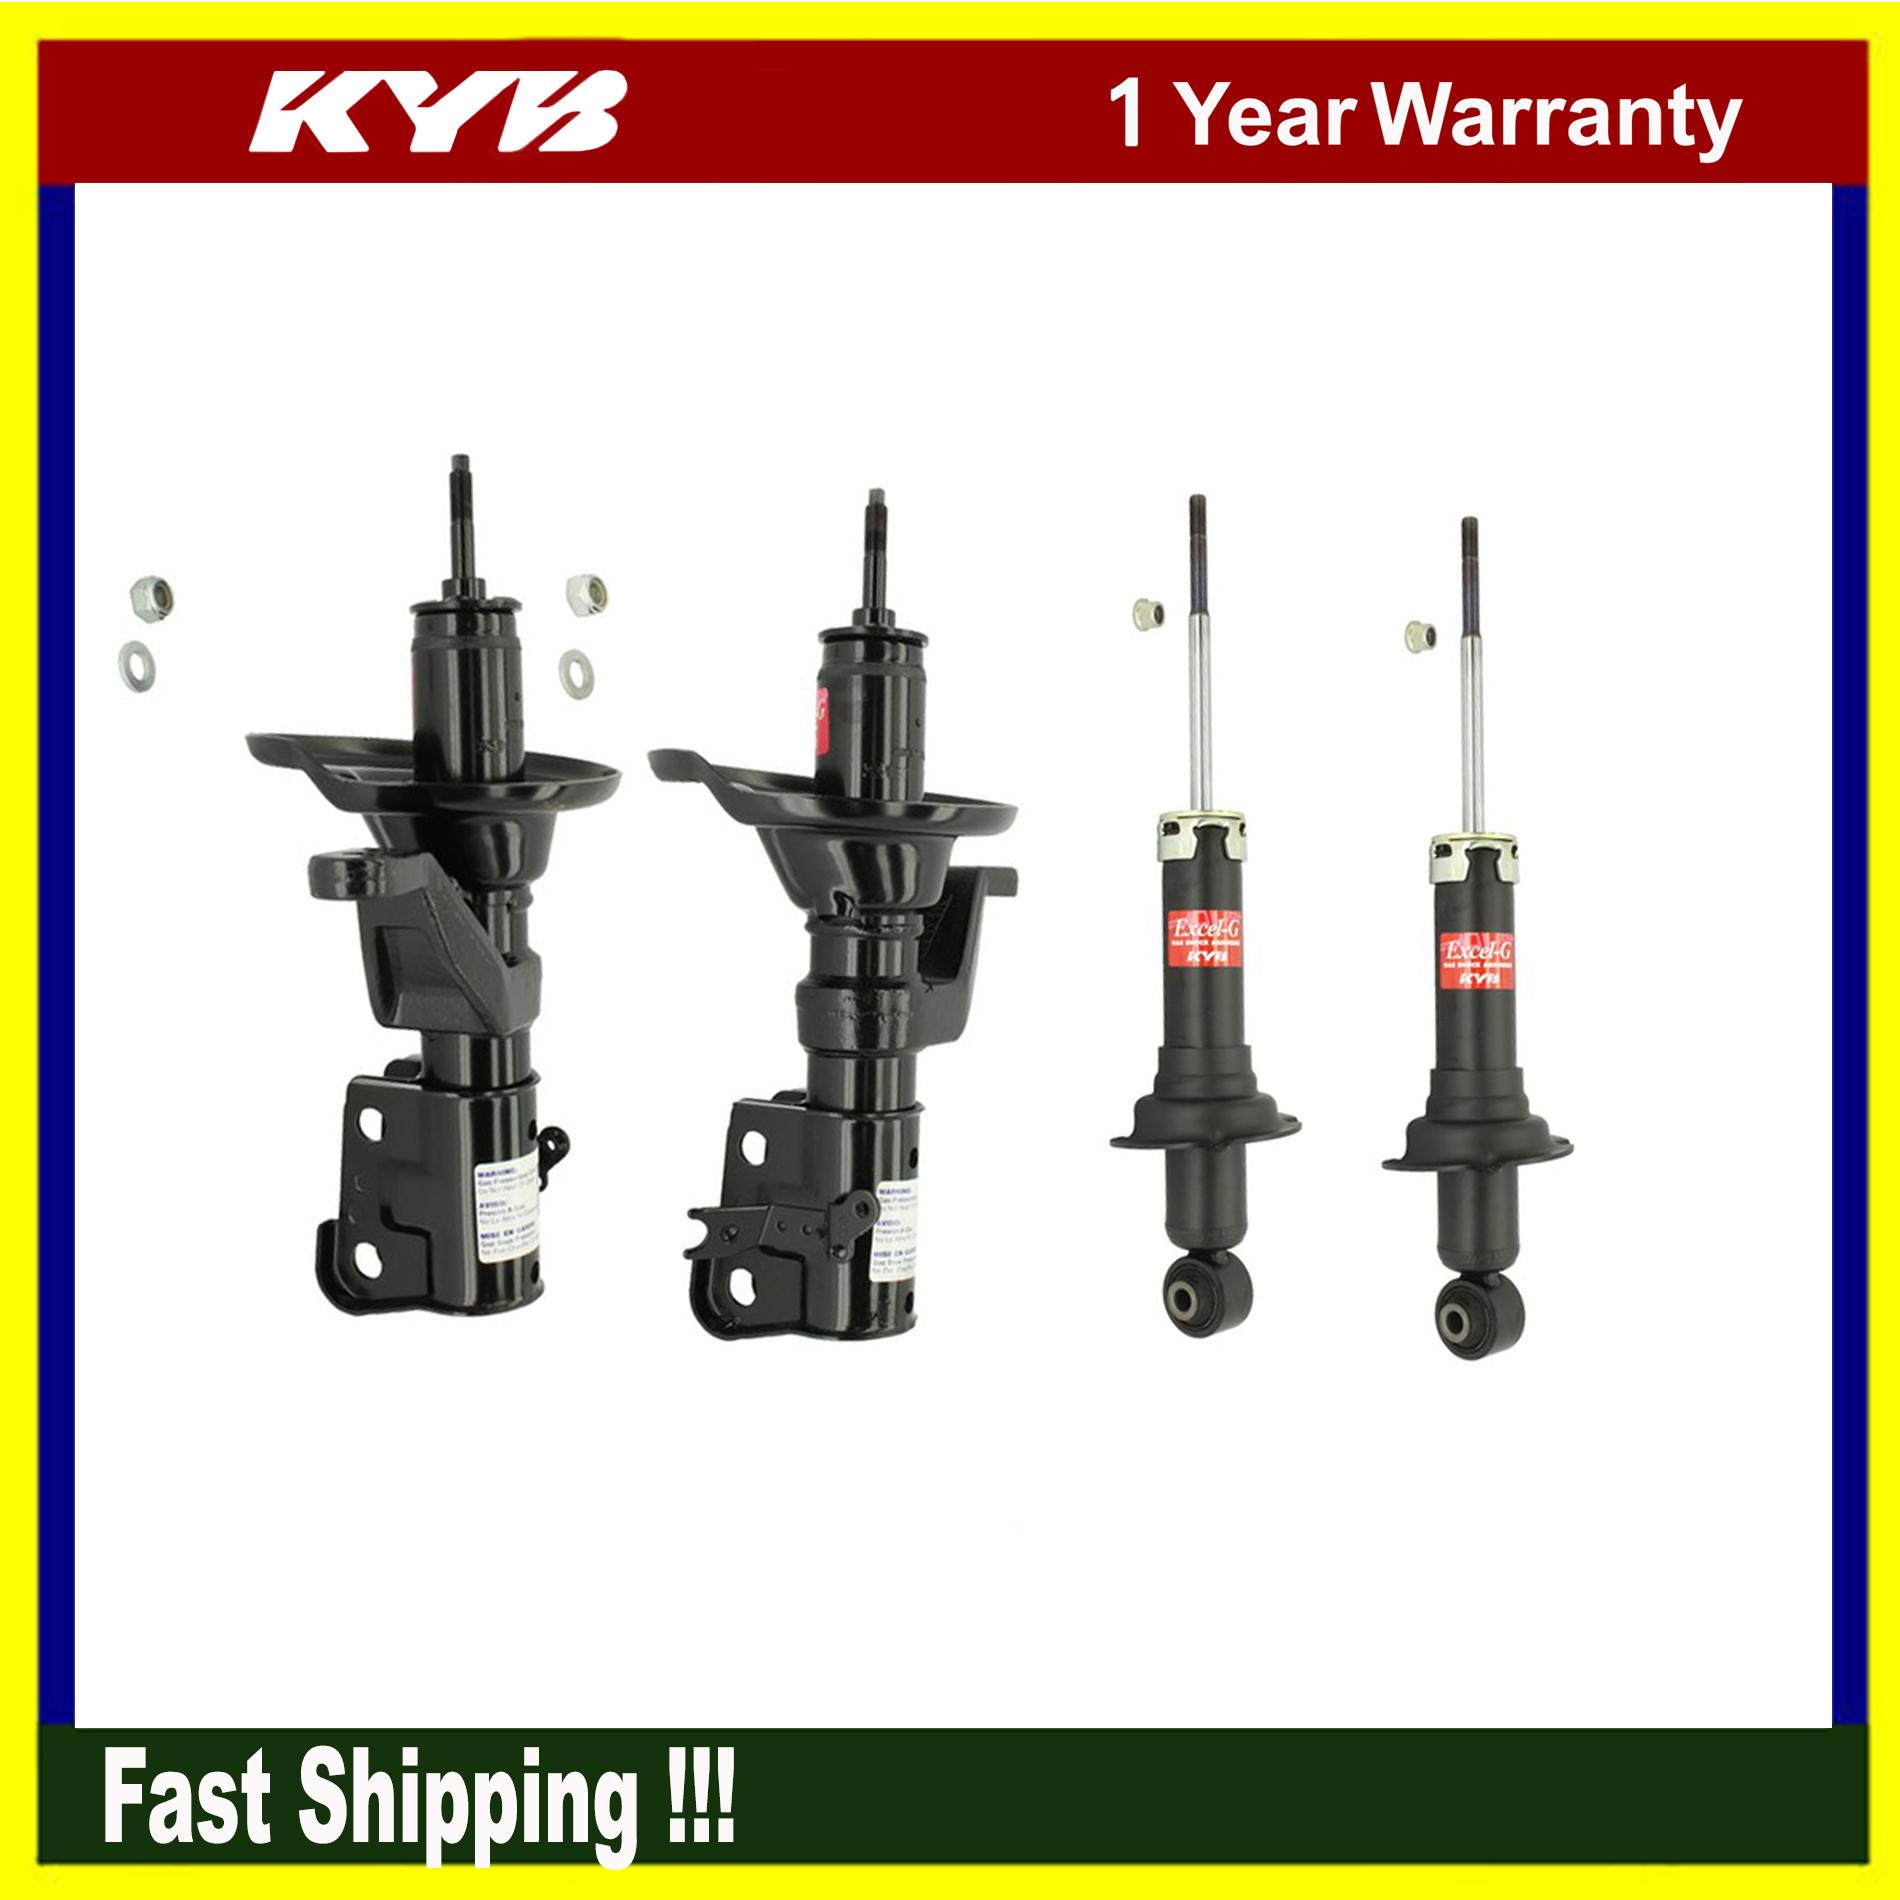 4PCs KYB Suspension Shock Struts Absorber Kits For 2003